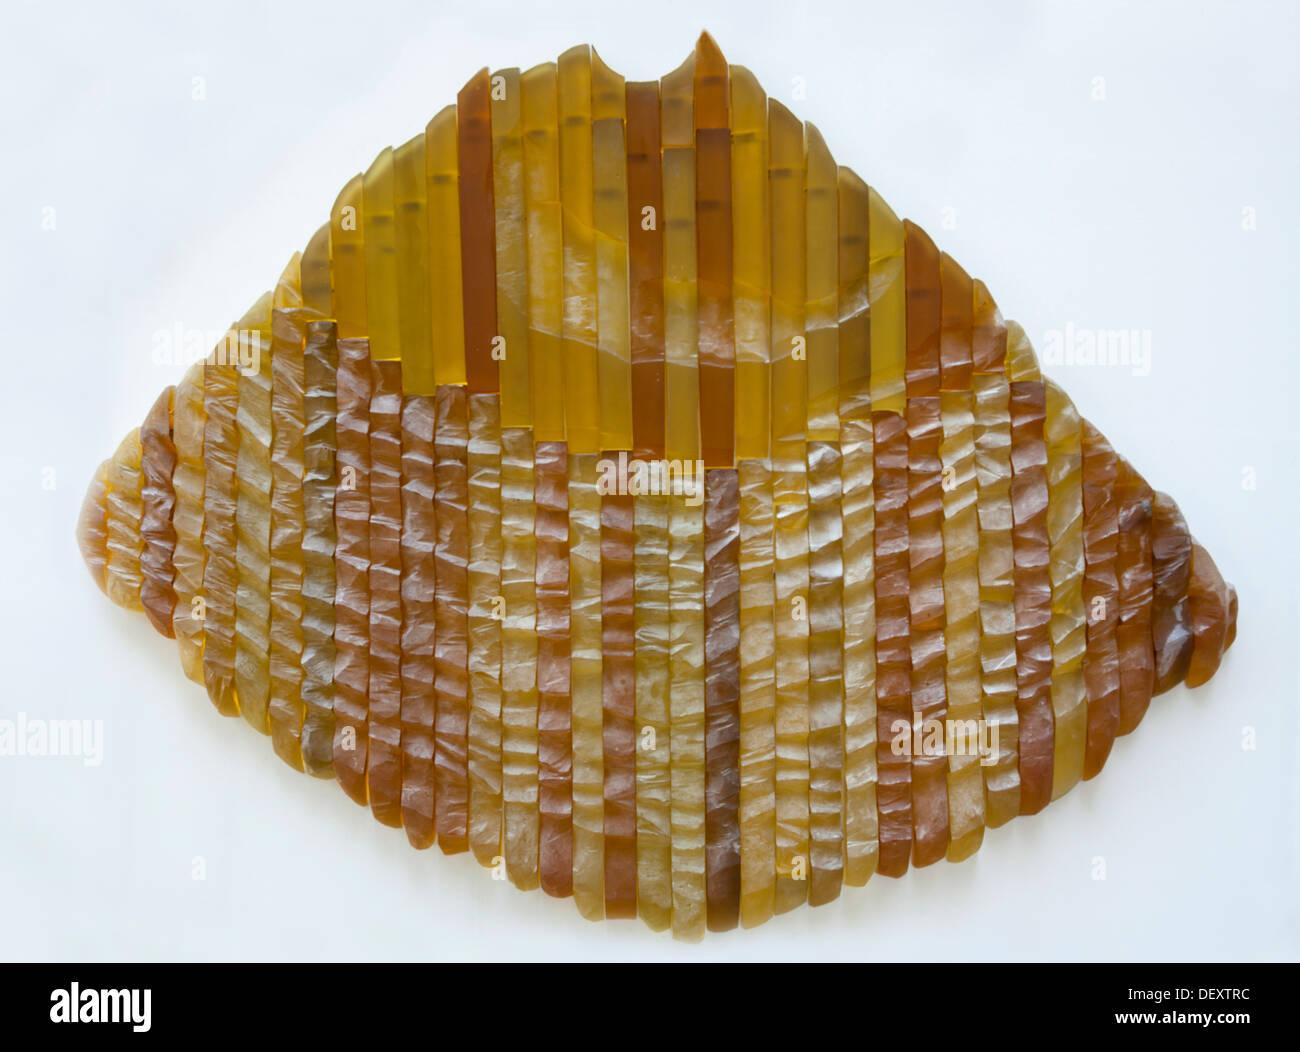 An Ursula Von Rydingsvard's work of Art entitled 'Glass' (Venice). Une oeuvre d'art d'Ursula Von Rydingsvard intitulée 'Verre'. - Stock Image